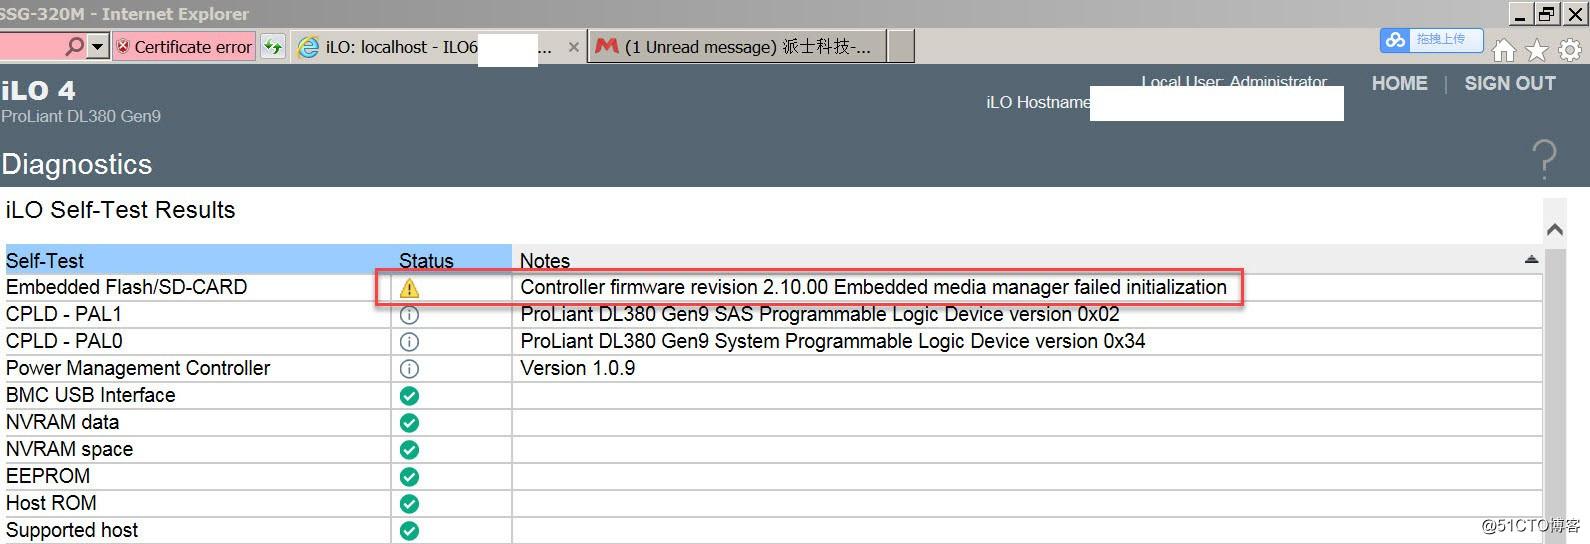 HP DL380G9 iLO降级Degrated及存储失败storage Failed报错如何